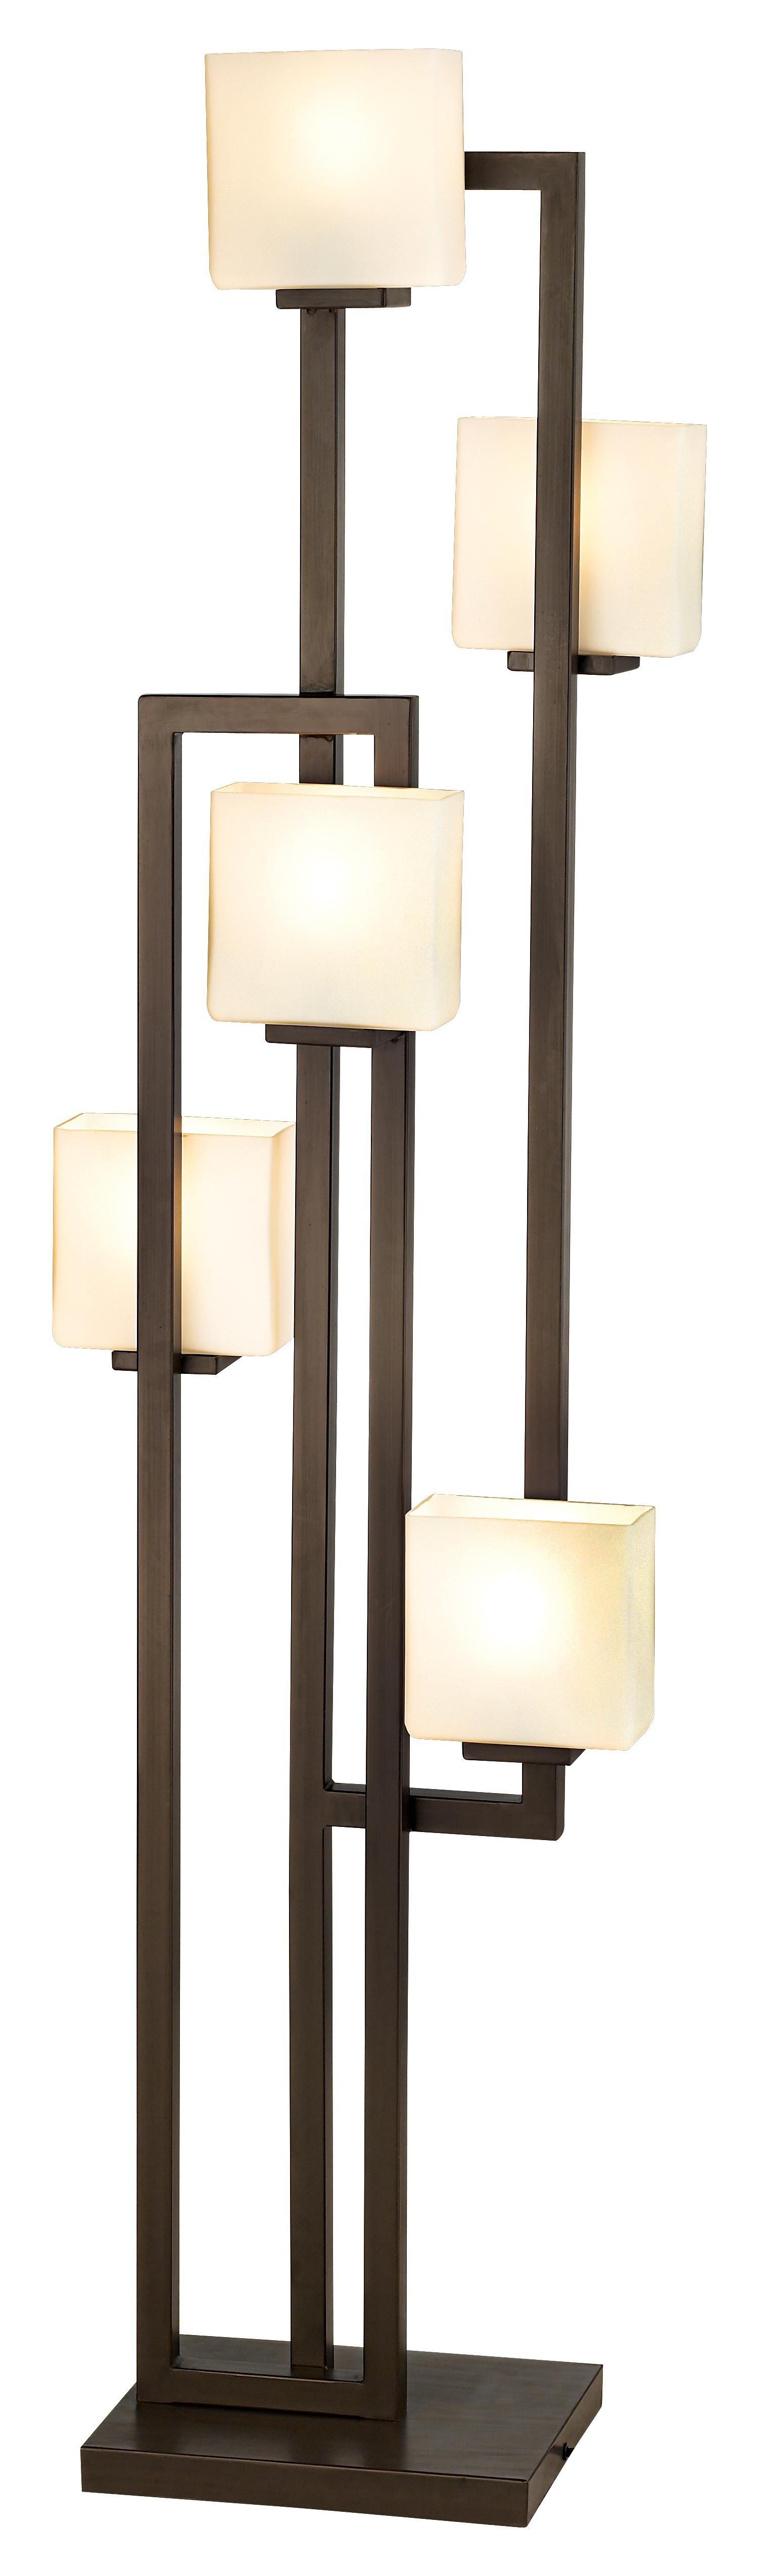 Possini Euro Lighting On The Square 5 Light Floor Lamp